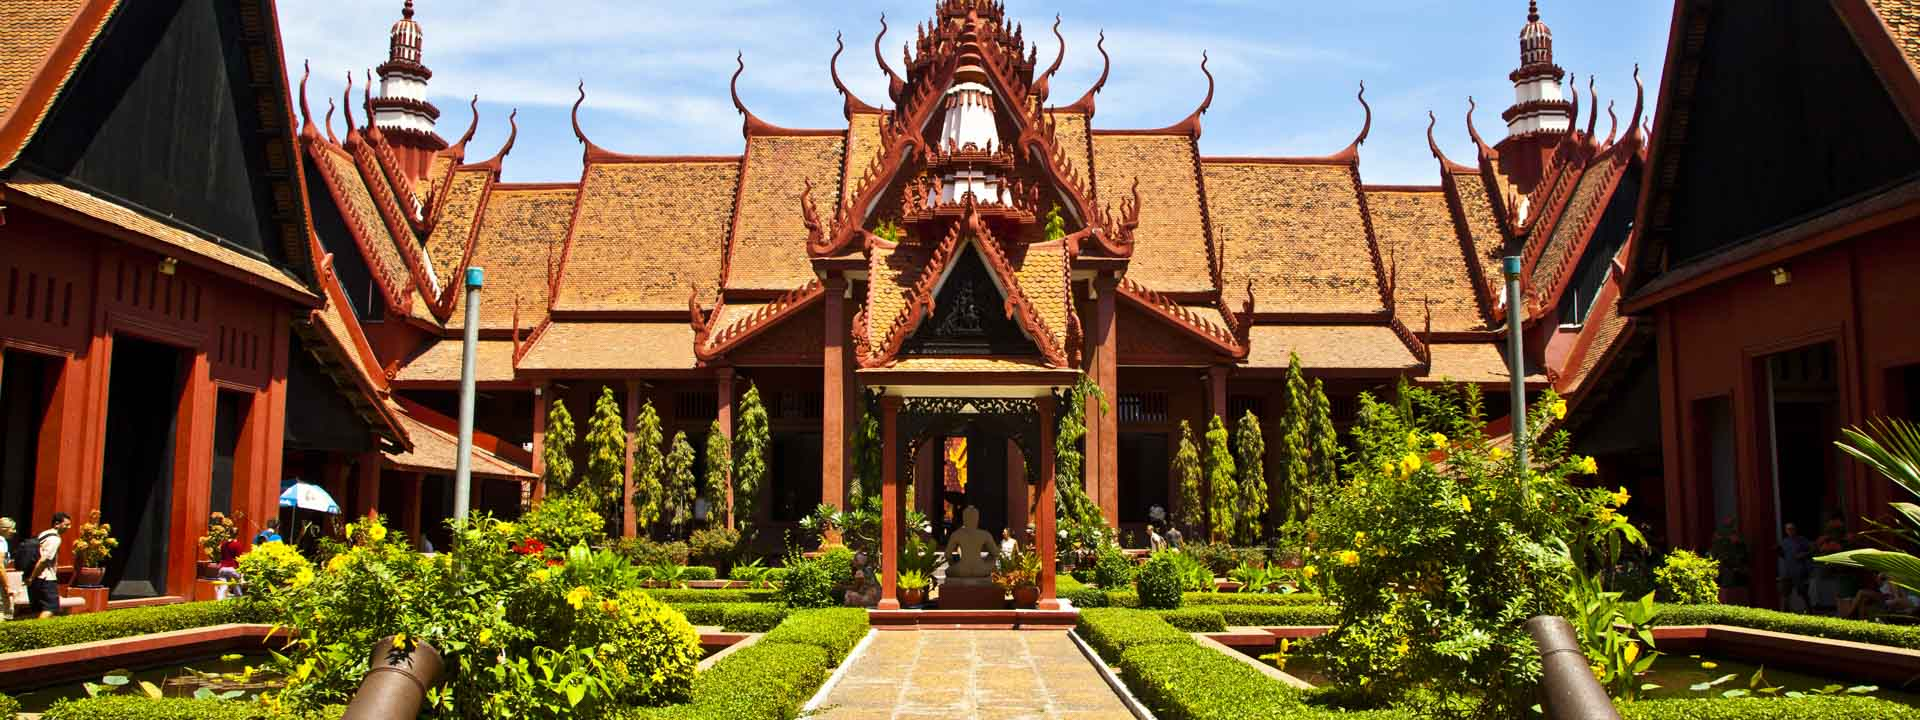 Phnom Penh and Siem Reap 3 days